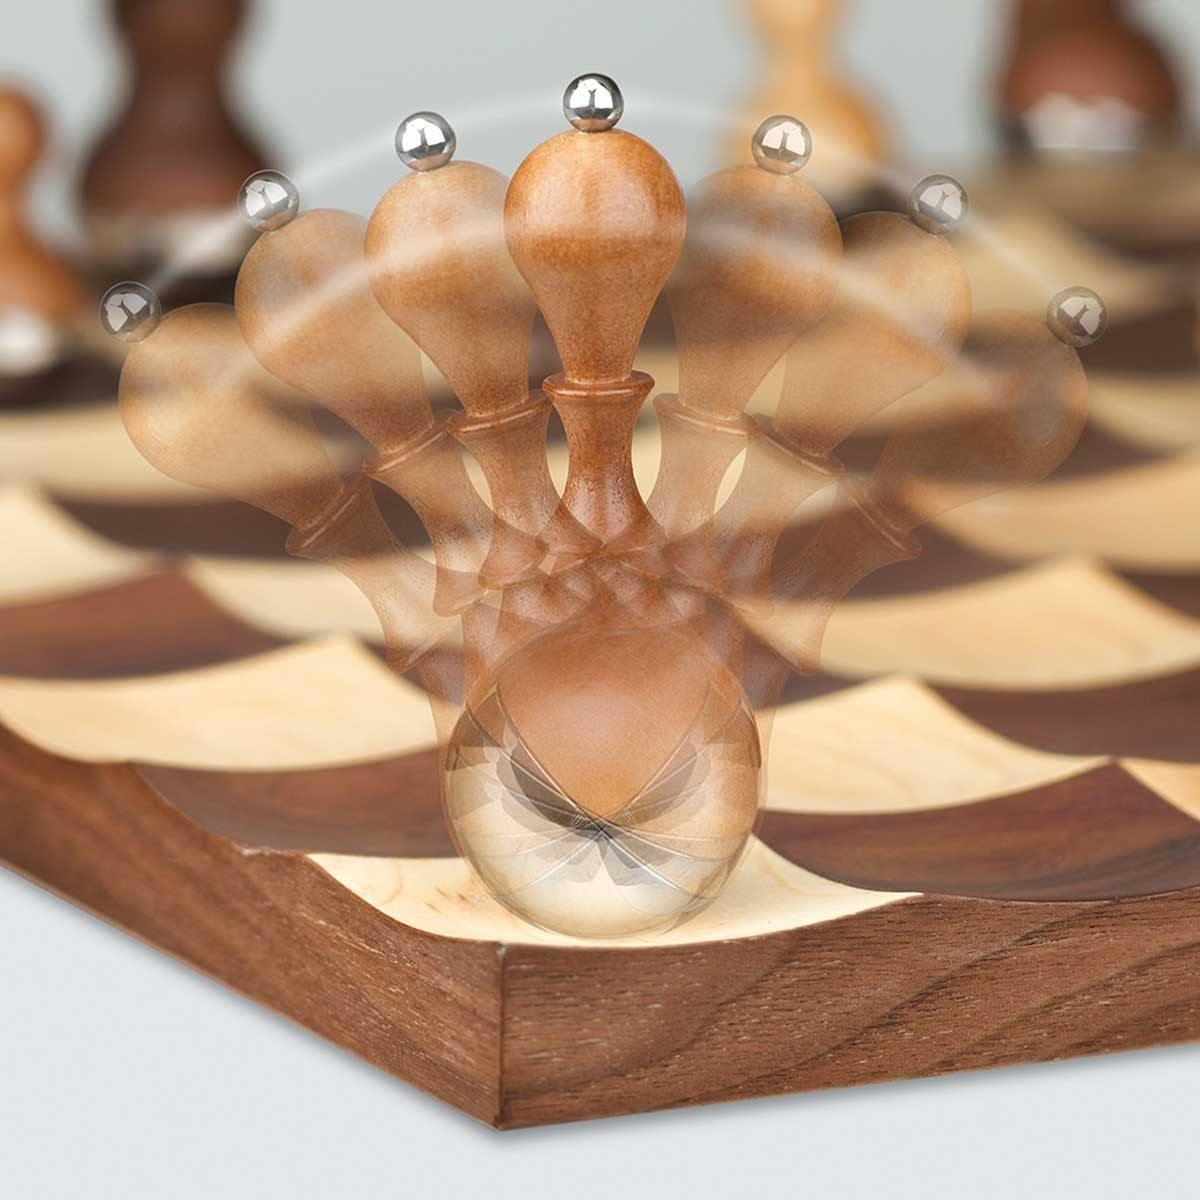 Gungande schackbräde